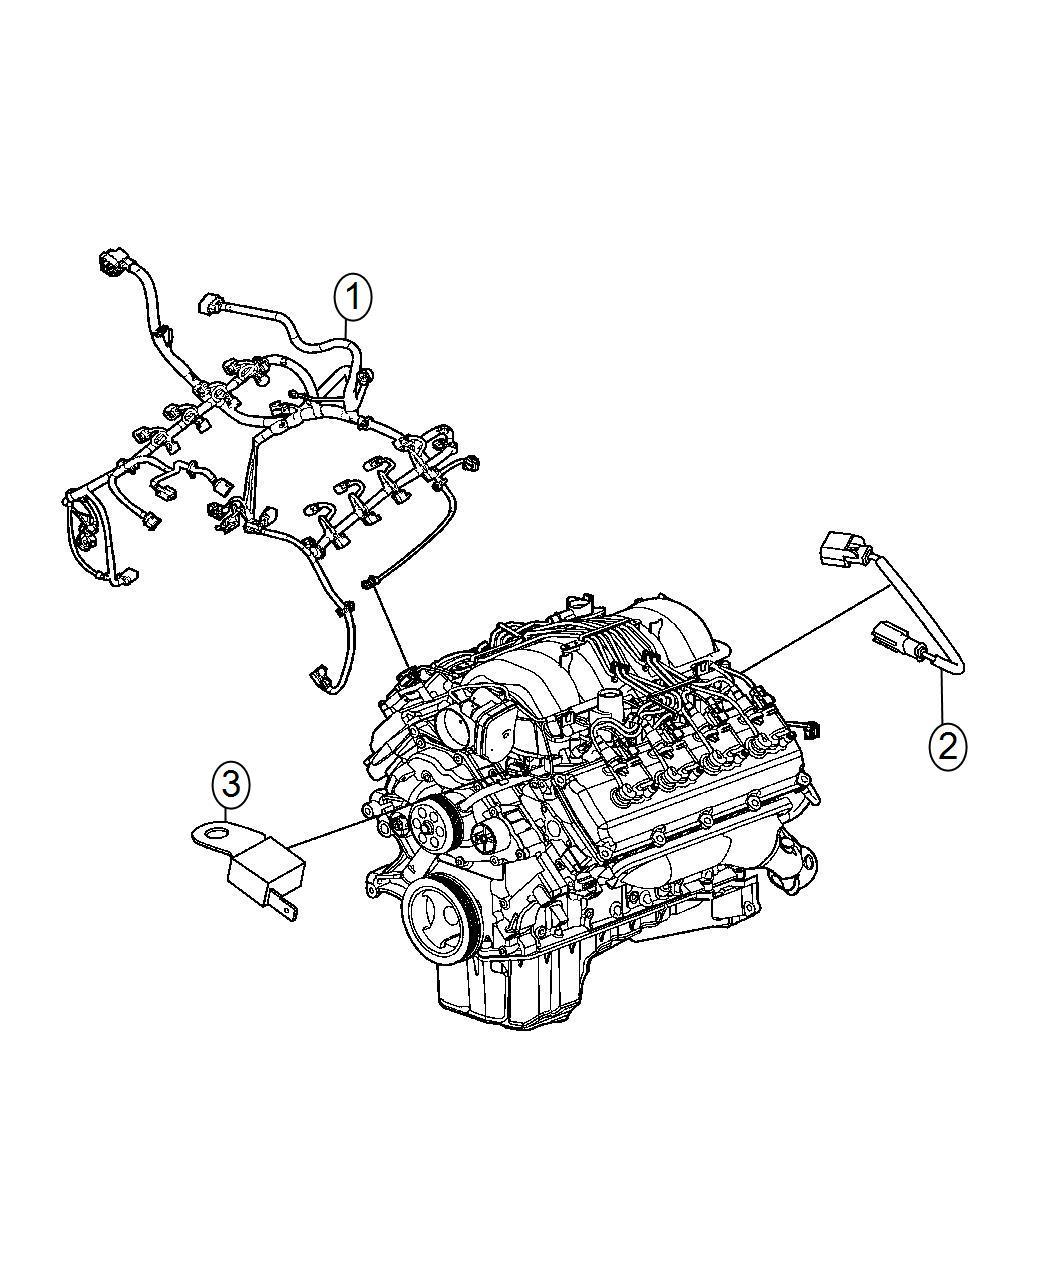 Dodge Charger Wiring Engine 220 Amp Alternator